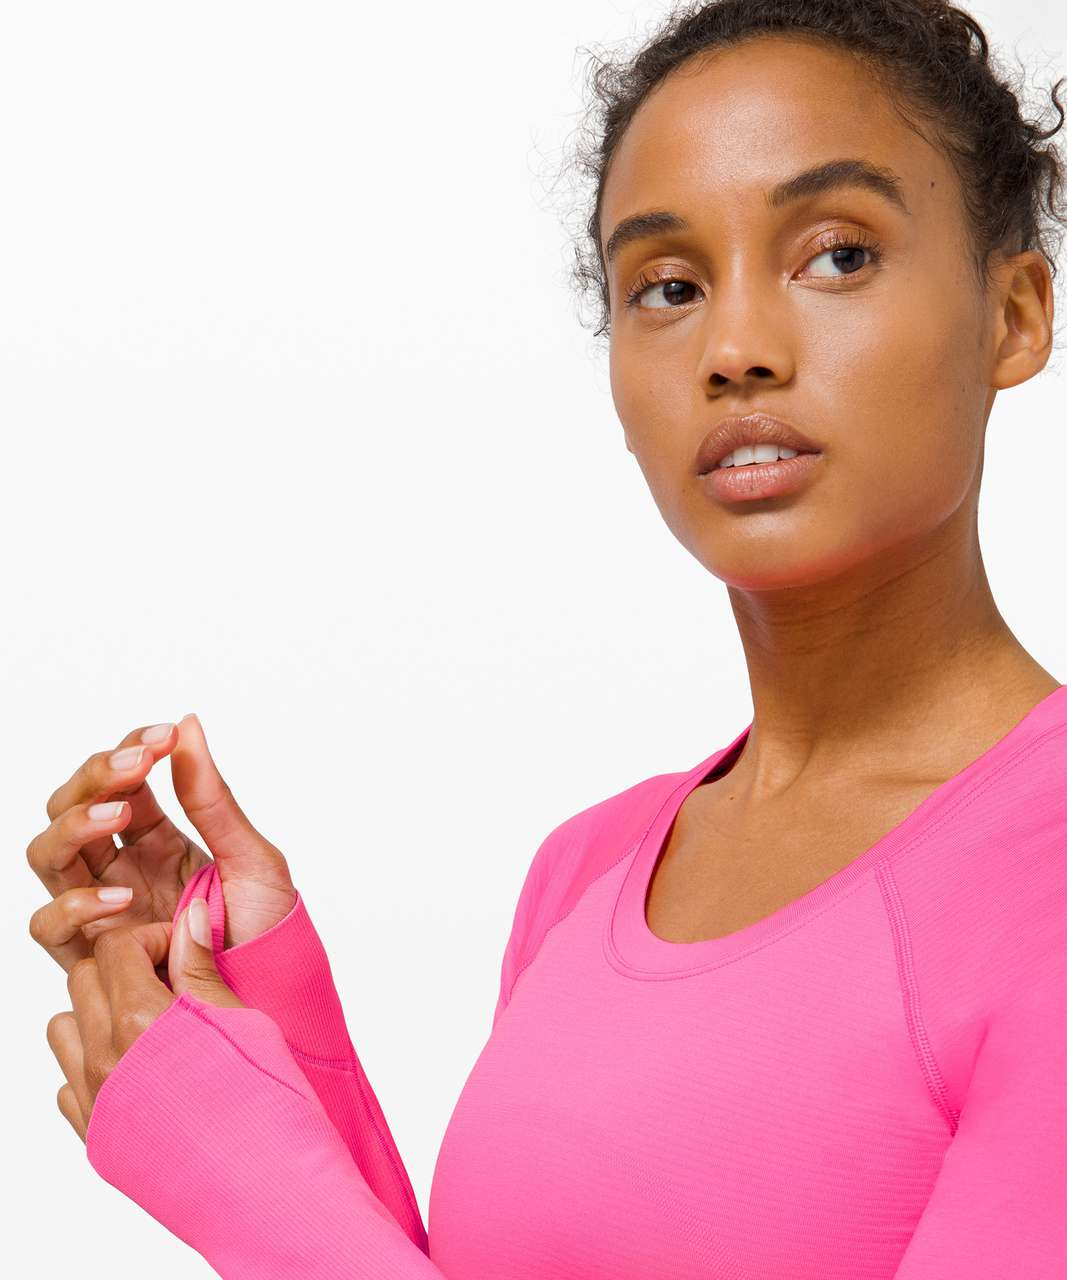 Lululemon Swiftly Tech Long Sleeve 2.0 *Race Length - Dark Prism Pink / Dark Prism Pink